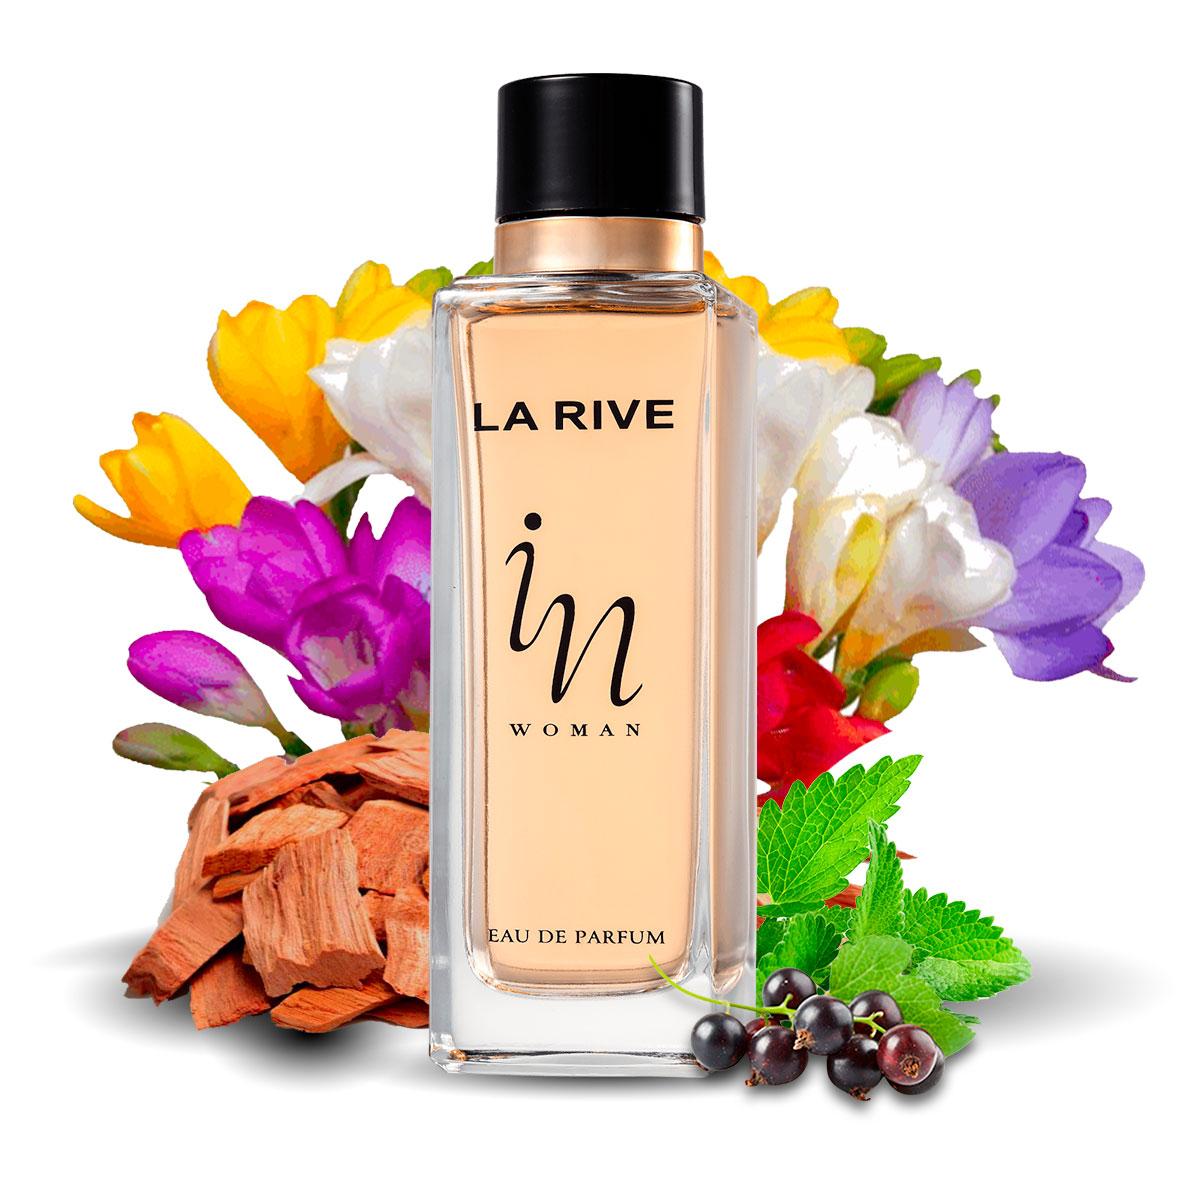 Kit 2 Perfumes Importados Black Creek e In Woman La Rive  - Mercari Perfumes